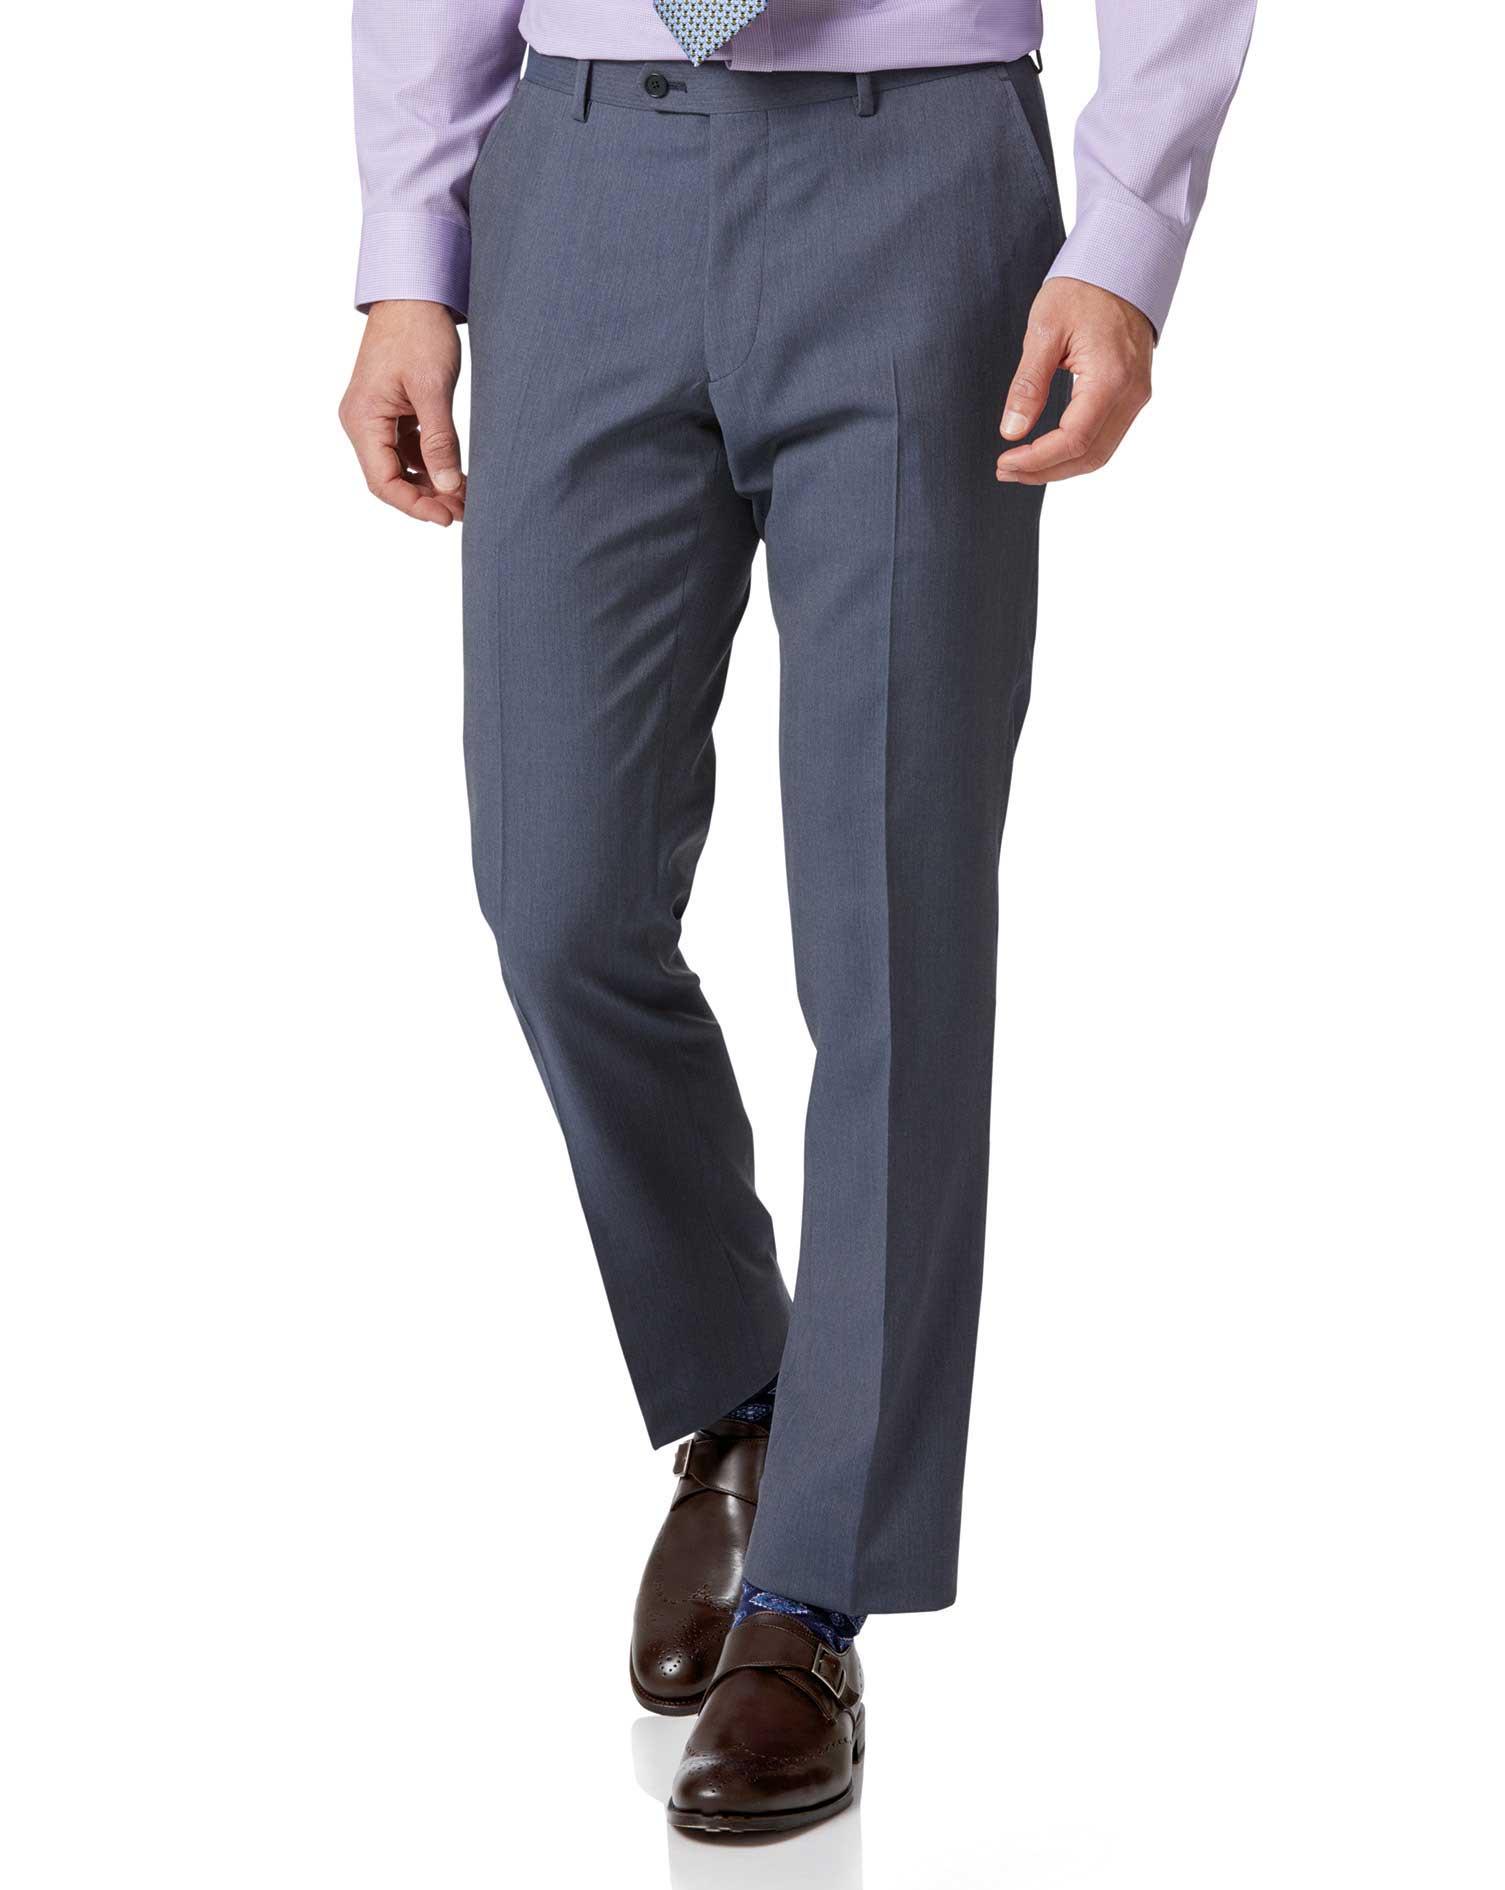 Light Blue Slim Fit Herringbone Business Suit Trousers Size W32 L34 by Charles Tyrwhitt